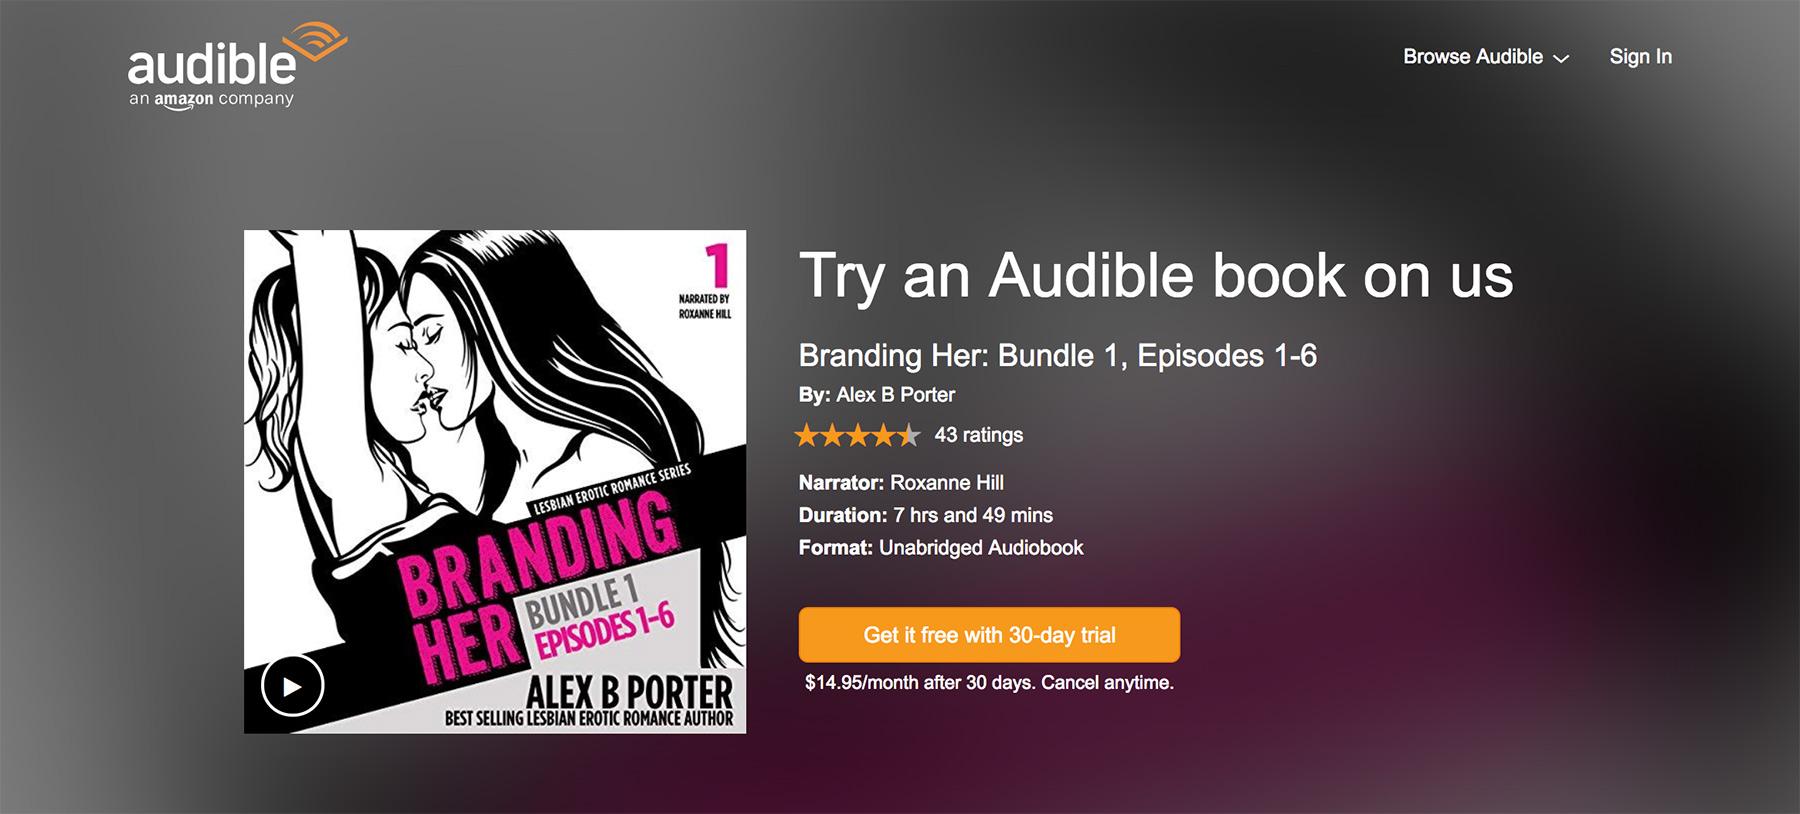 Branding_Her_lesbian_erotic_romance_audiobook